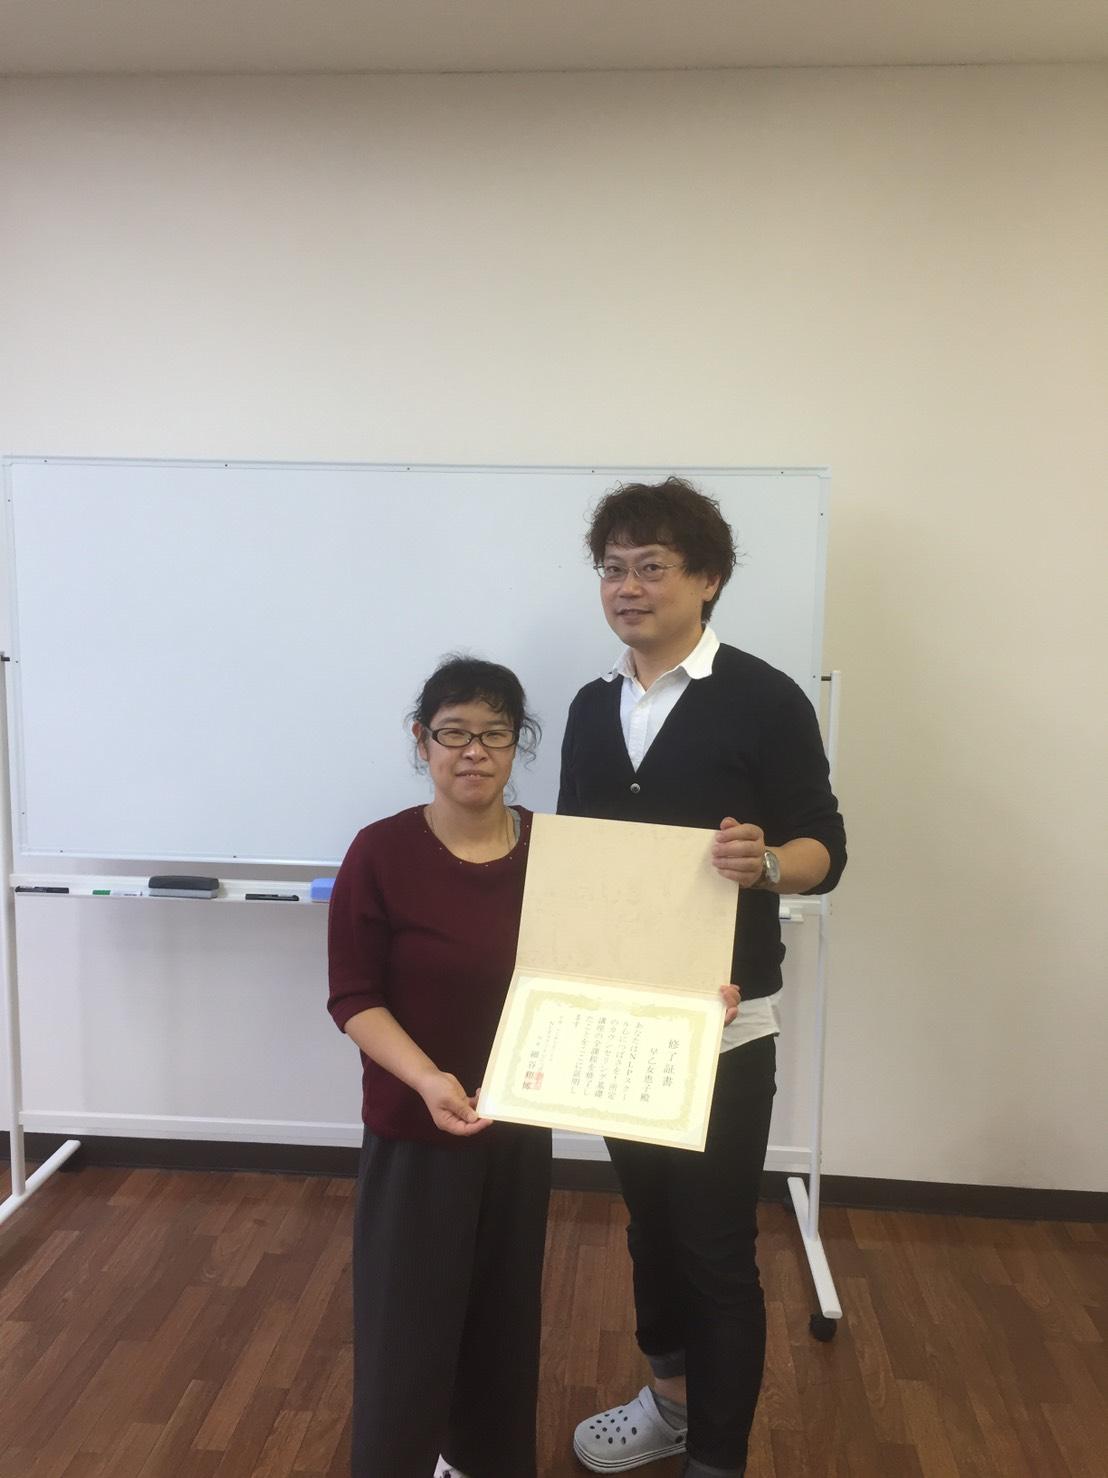 http://www.nlp-school.com/news/2016/10/03/S__39550982.jpg